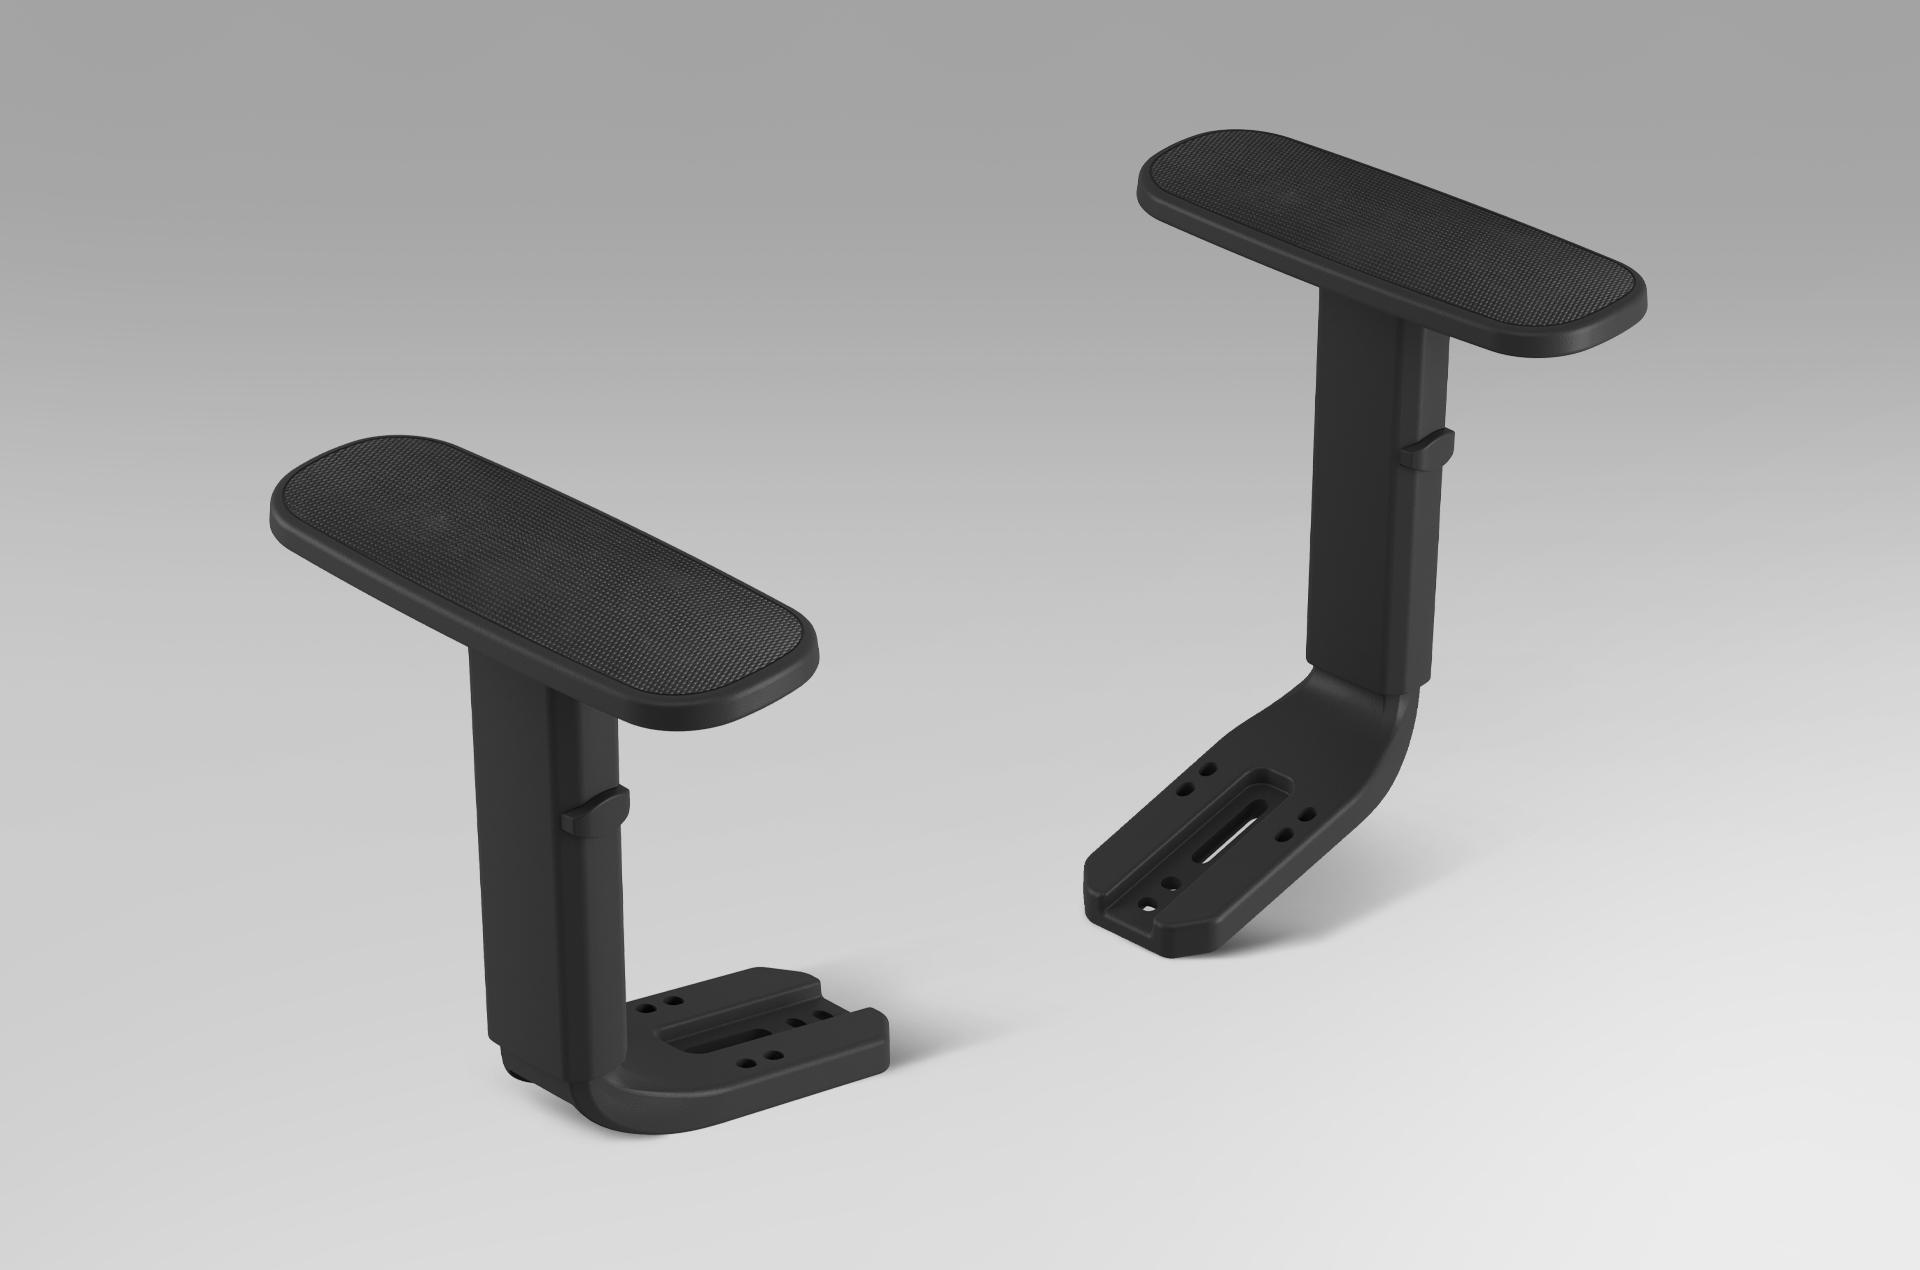 jump-the-new-adjustable-armrest-for-startup-seats